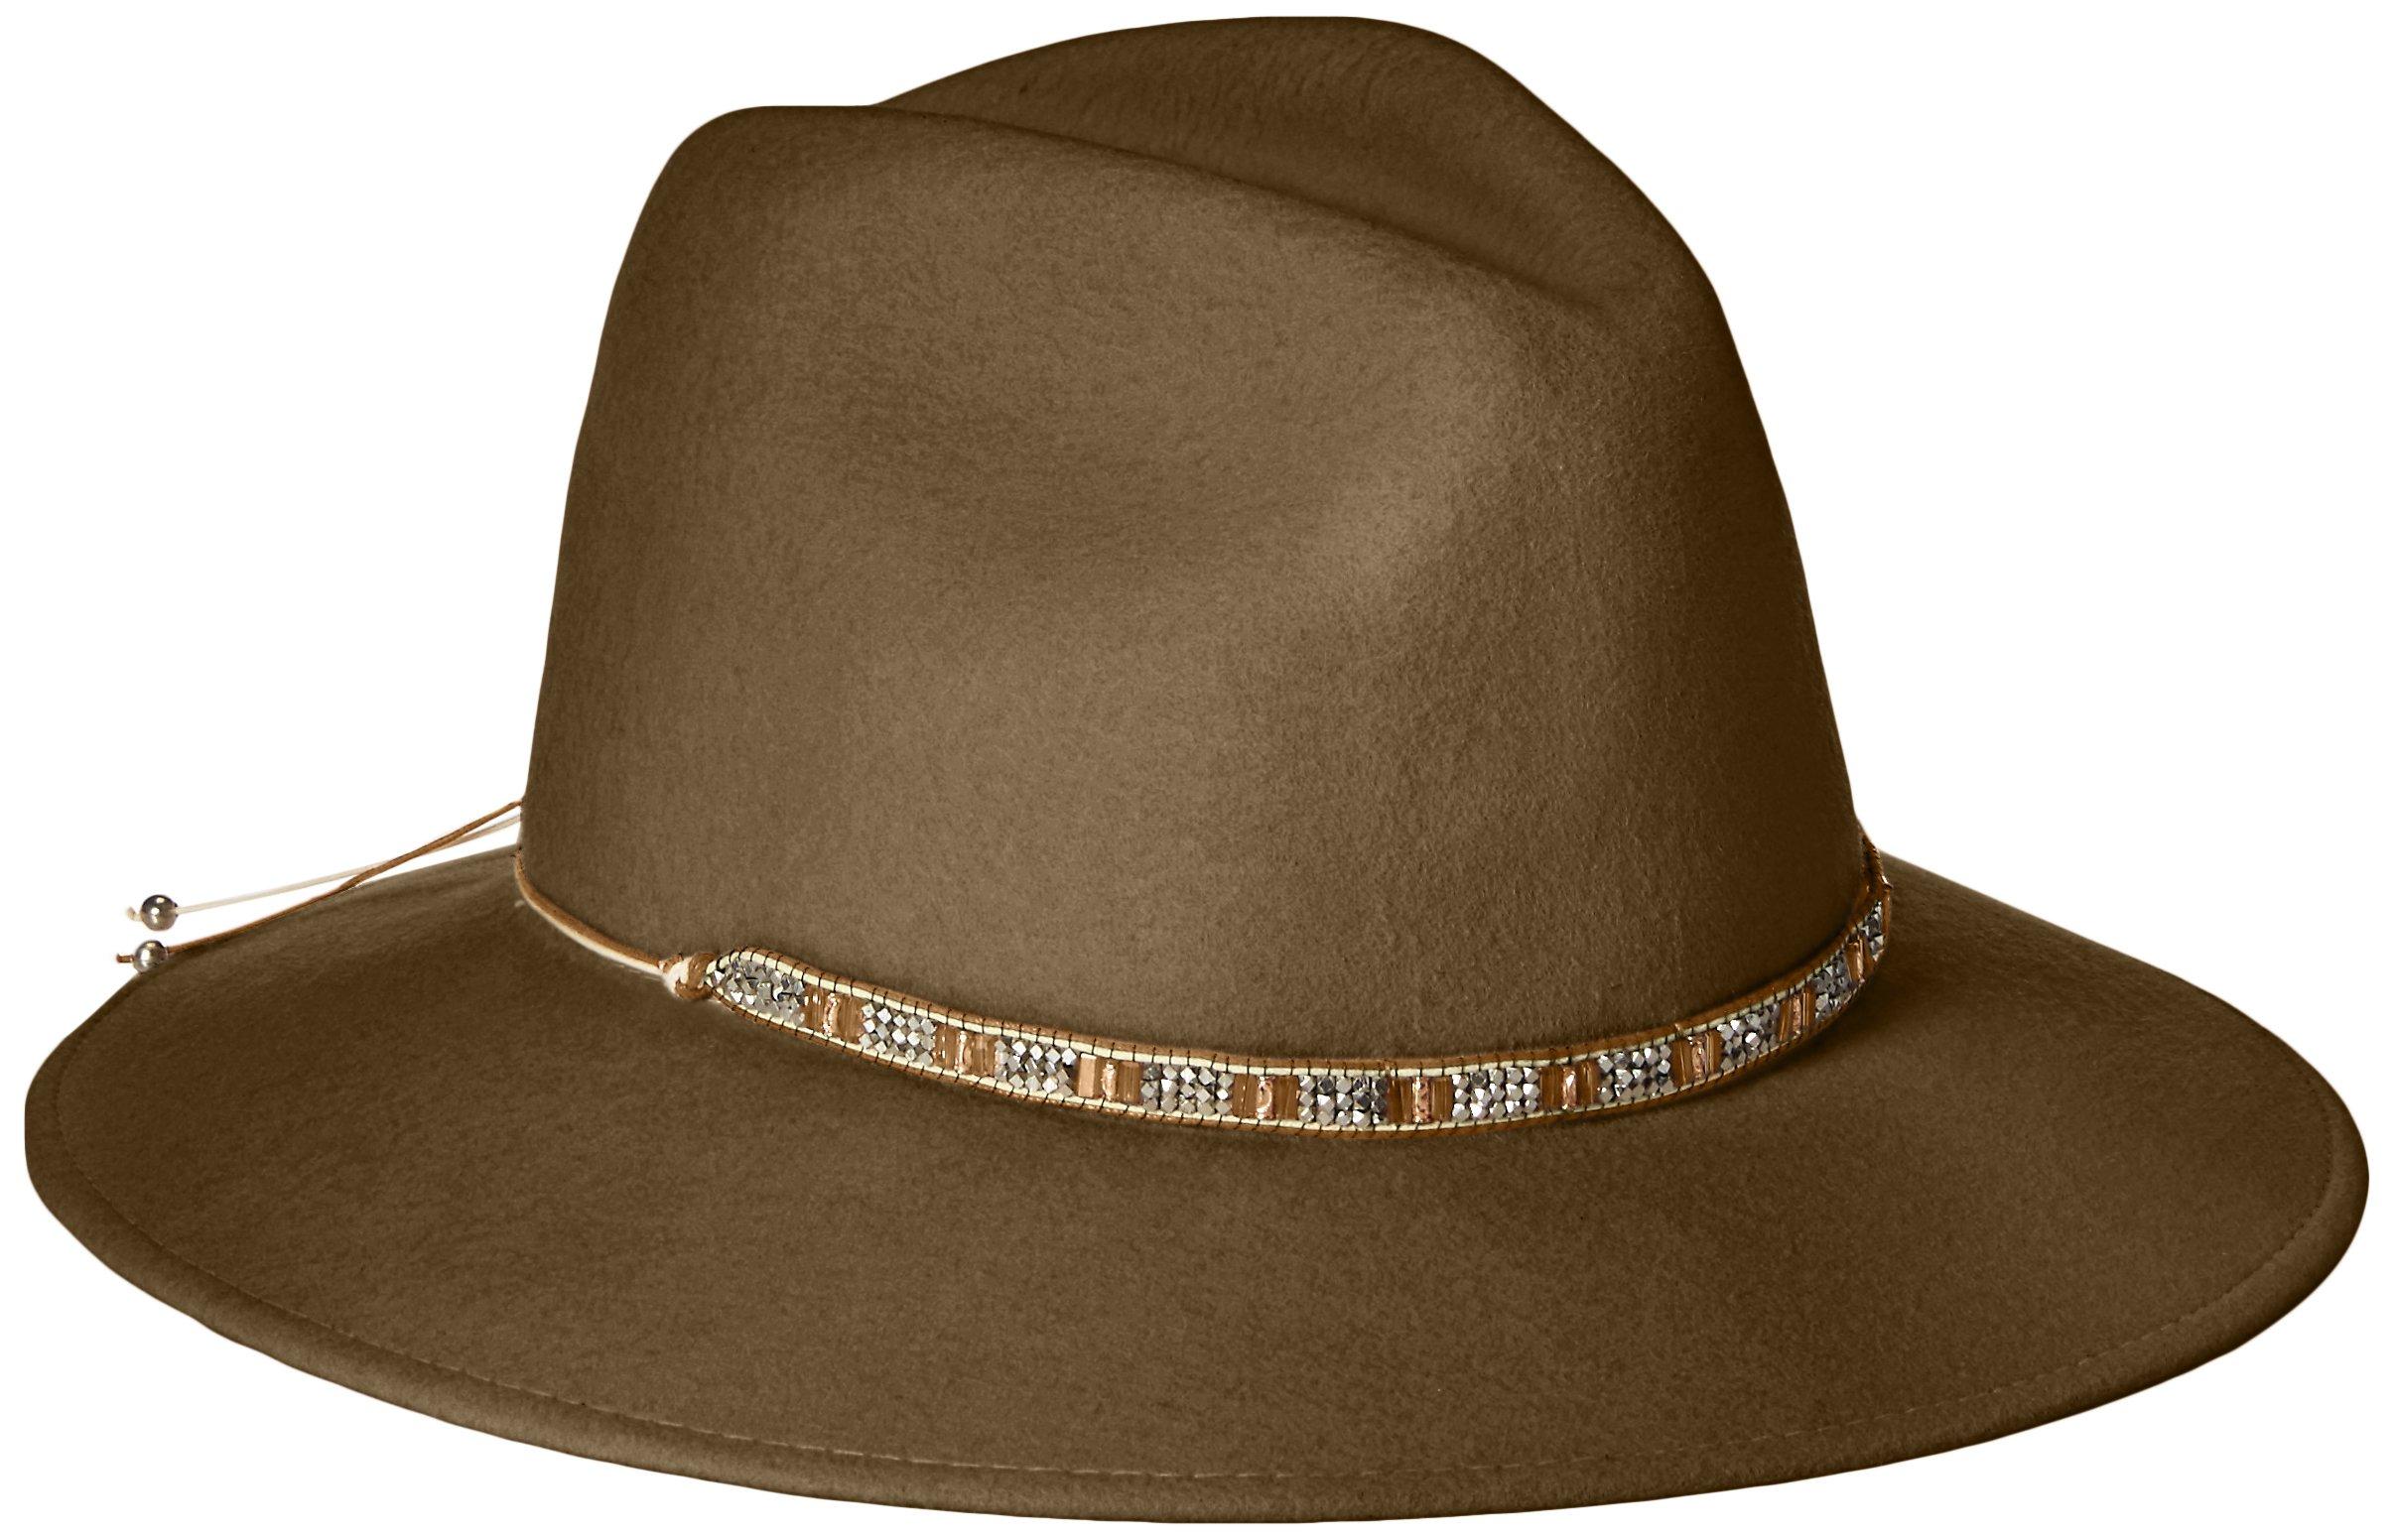 Gottex Women's Moonlight Wool Felt Sun Hat w/Jewel Trim, Rated UPF 50+ For Max Sun Protection, Brown, Adjustable Head Size